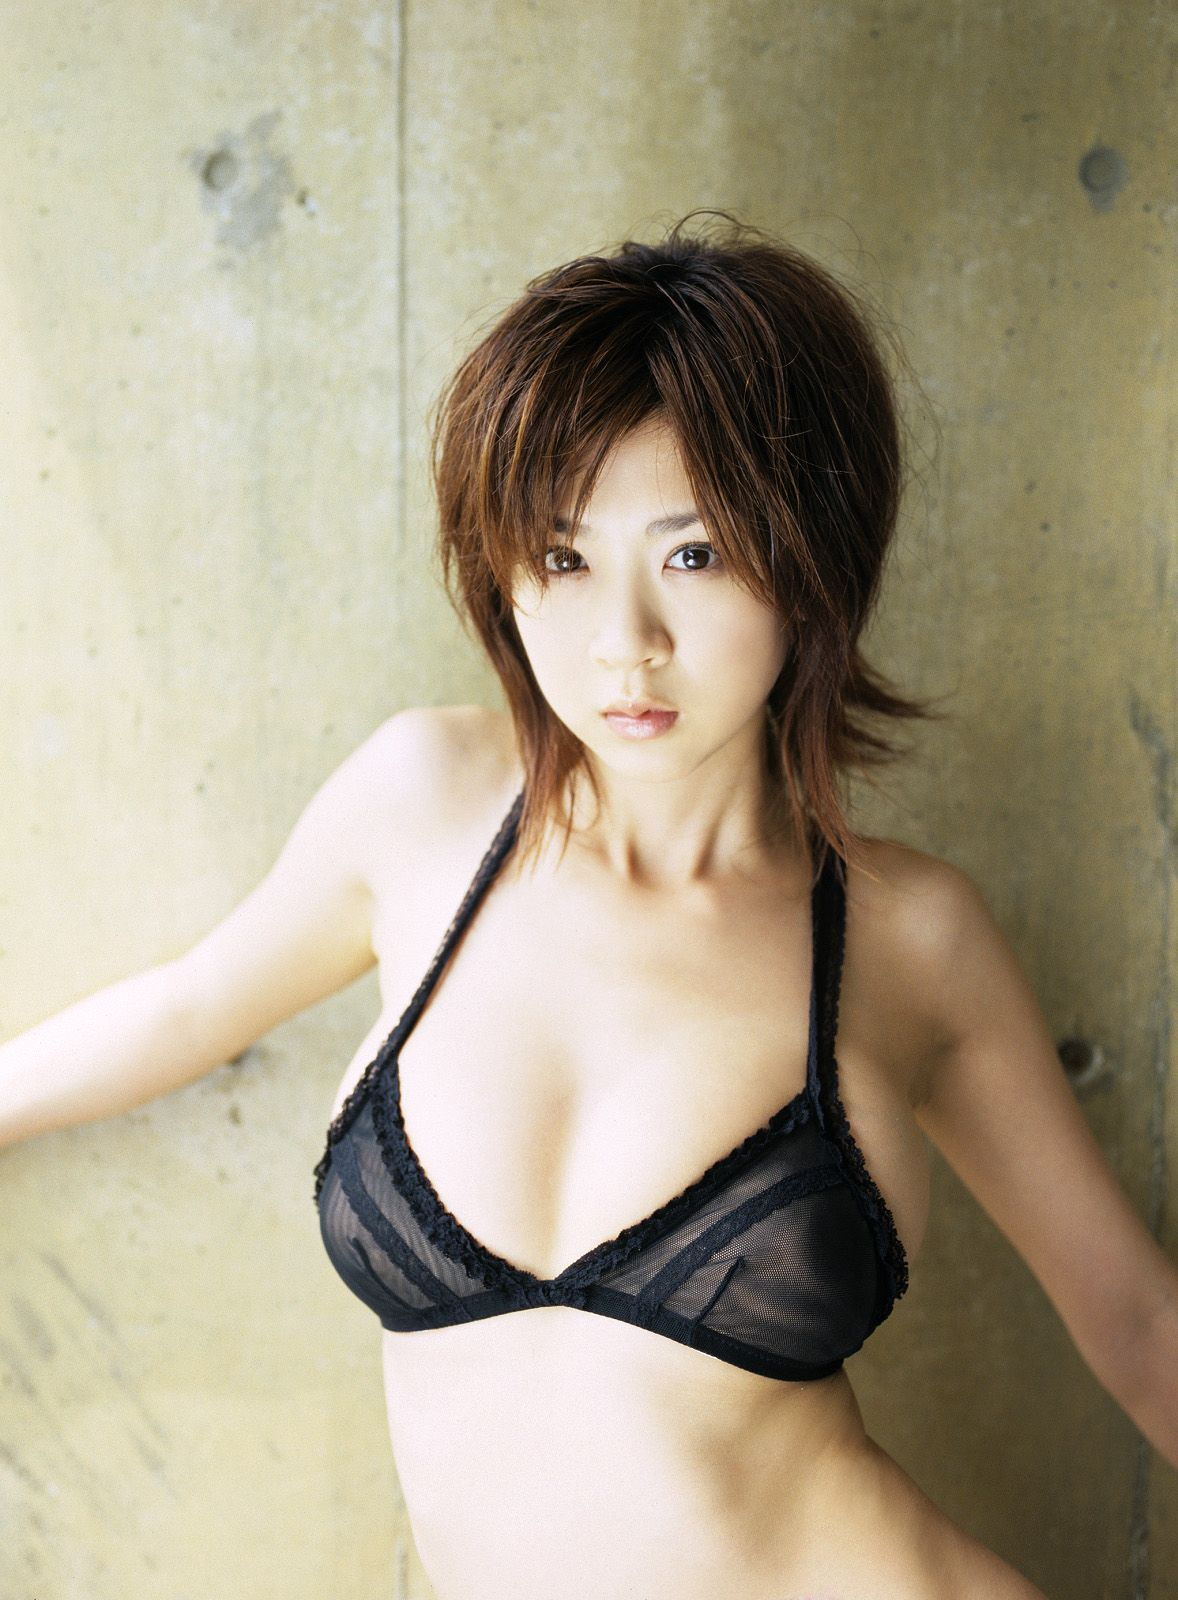 Aki Hoshino ほしのあき 1977 3 14